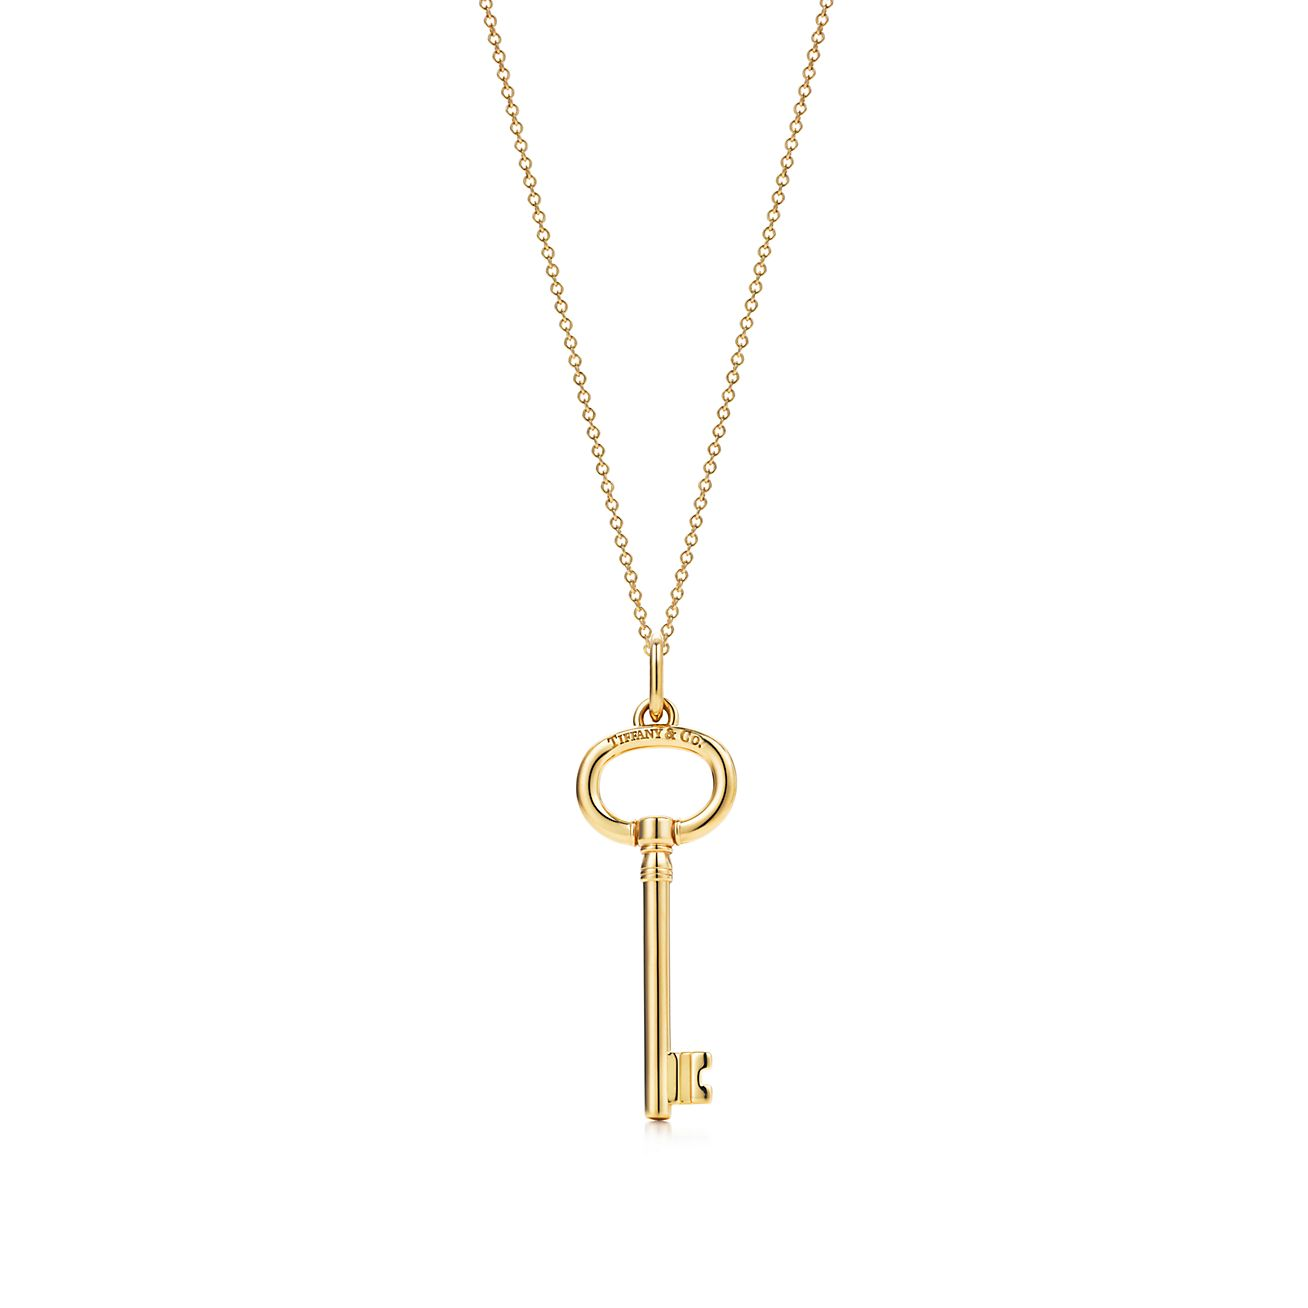 Tiffany Keys oval key pendant in 18k gold on a chain. | Tiffany & Co.